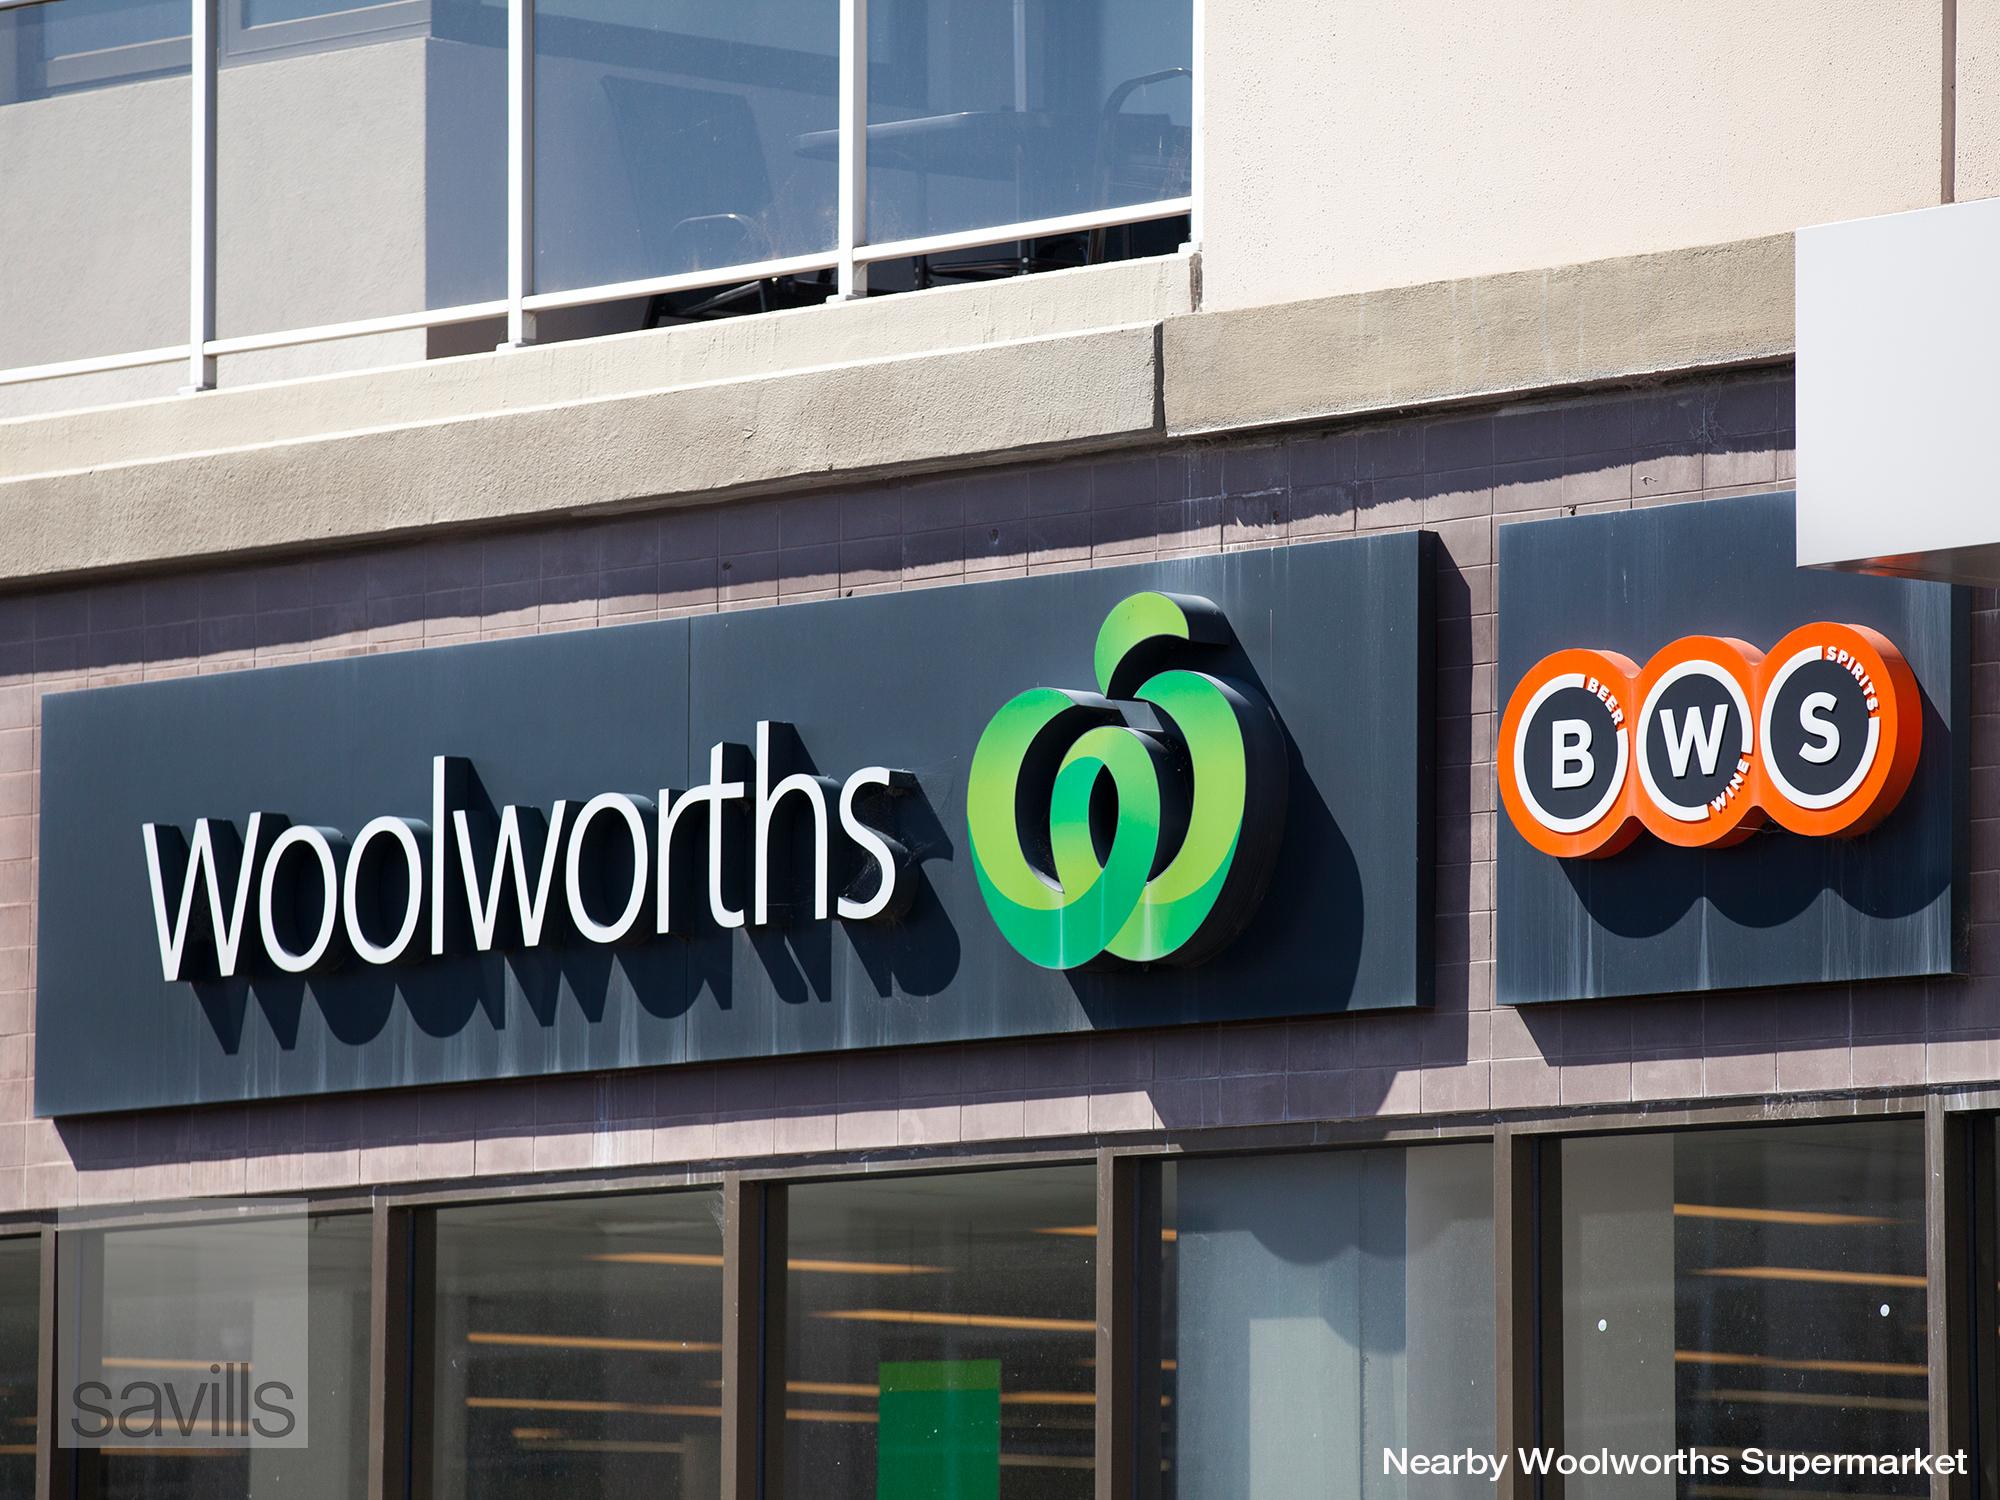 6 - Nearby Woolworths Supermarket.jpg